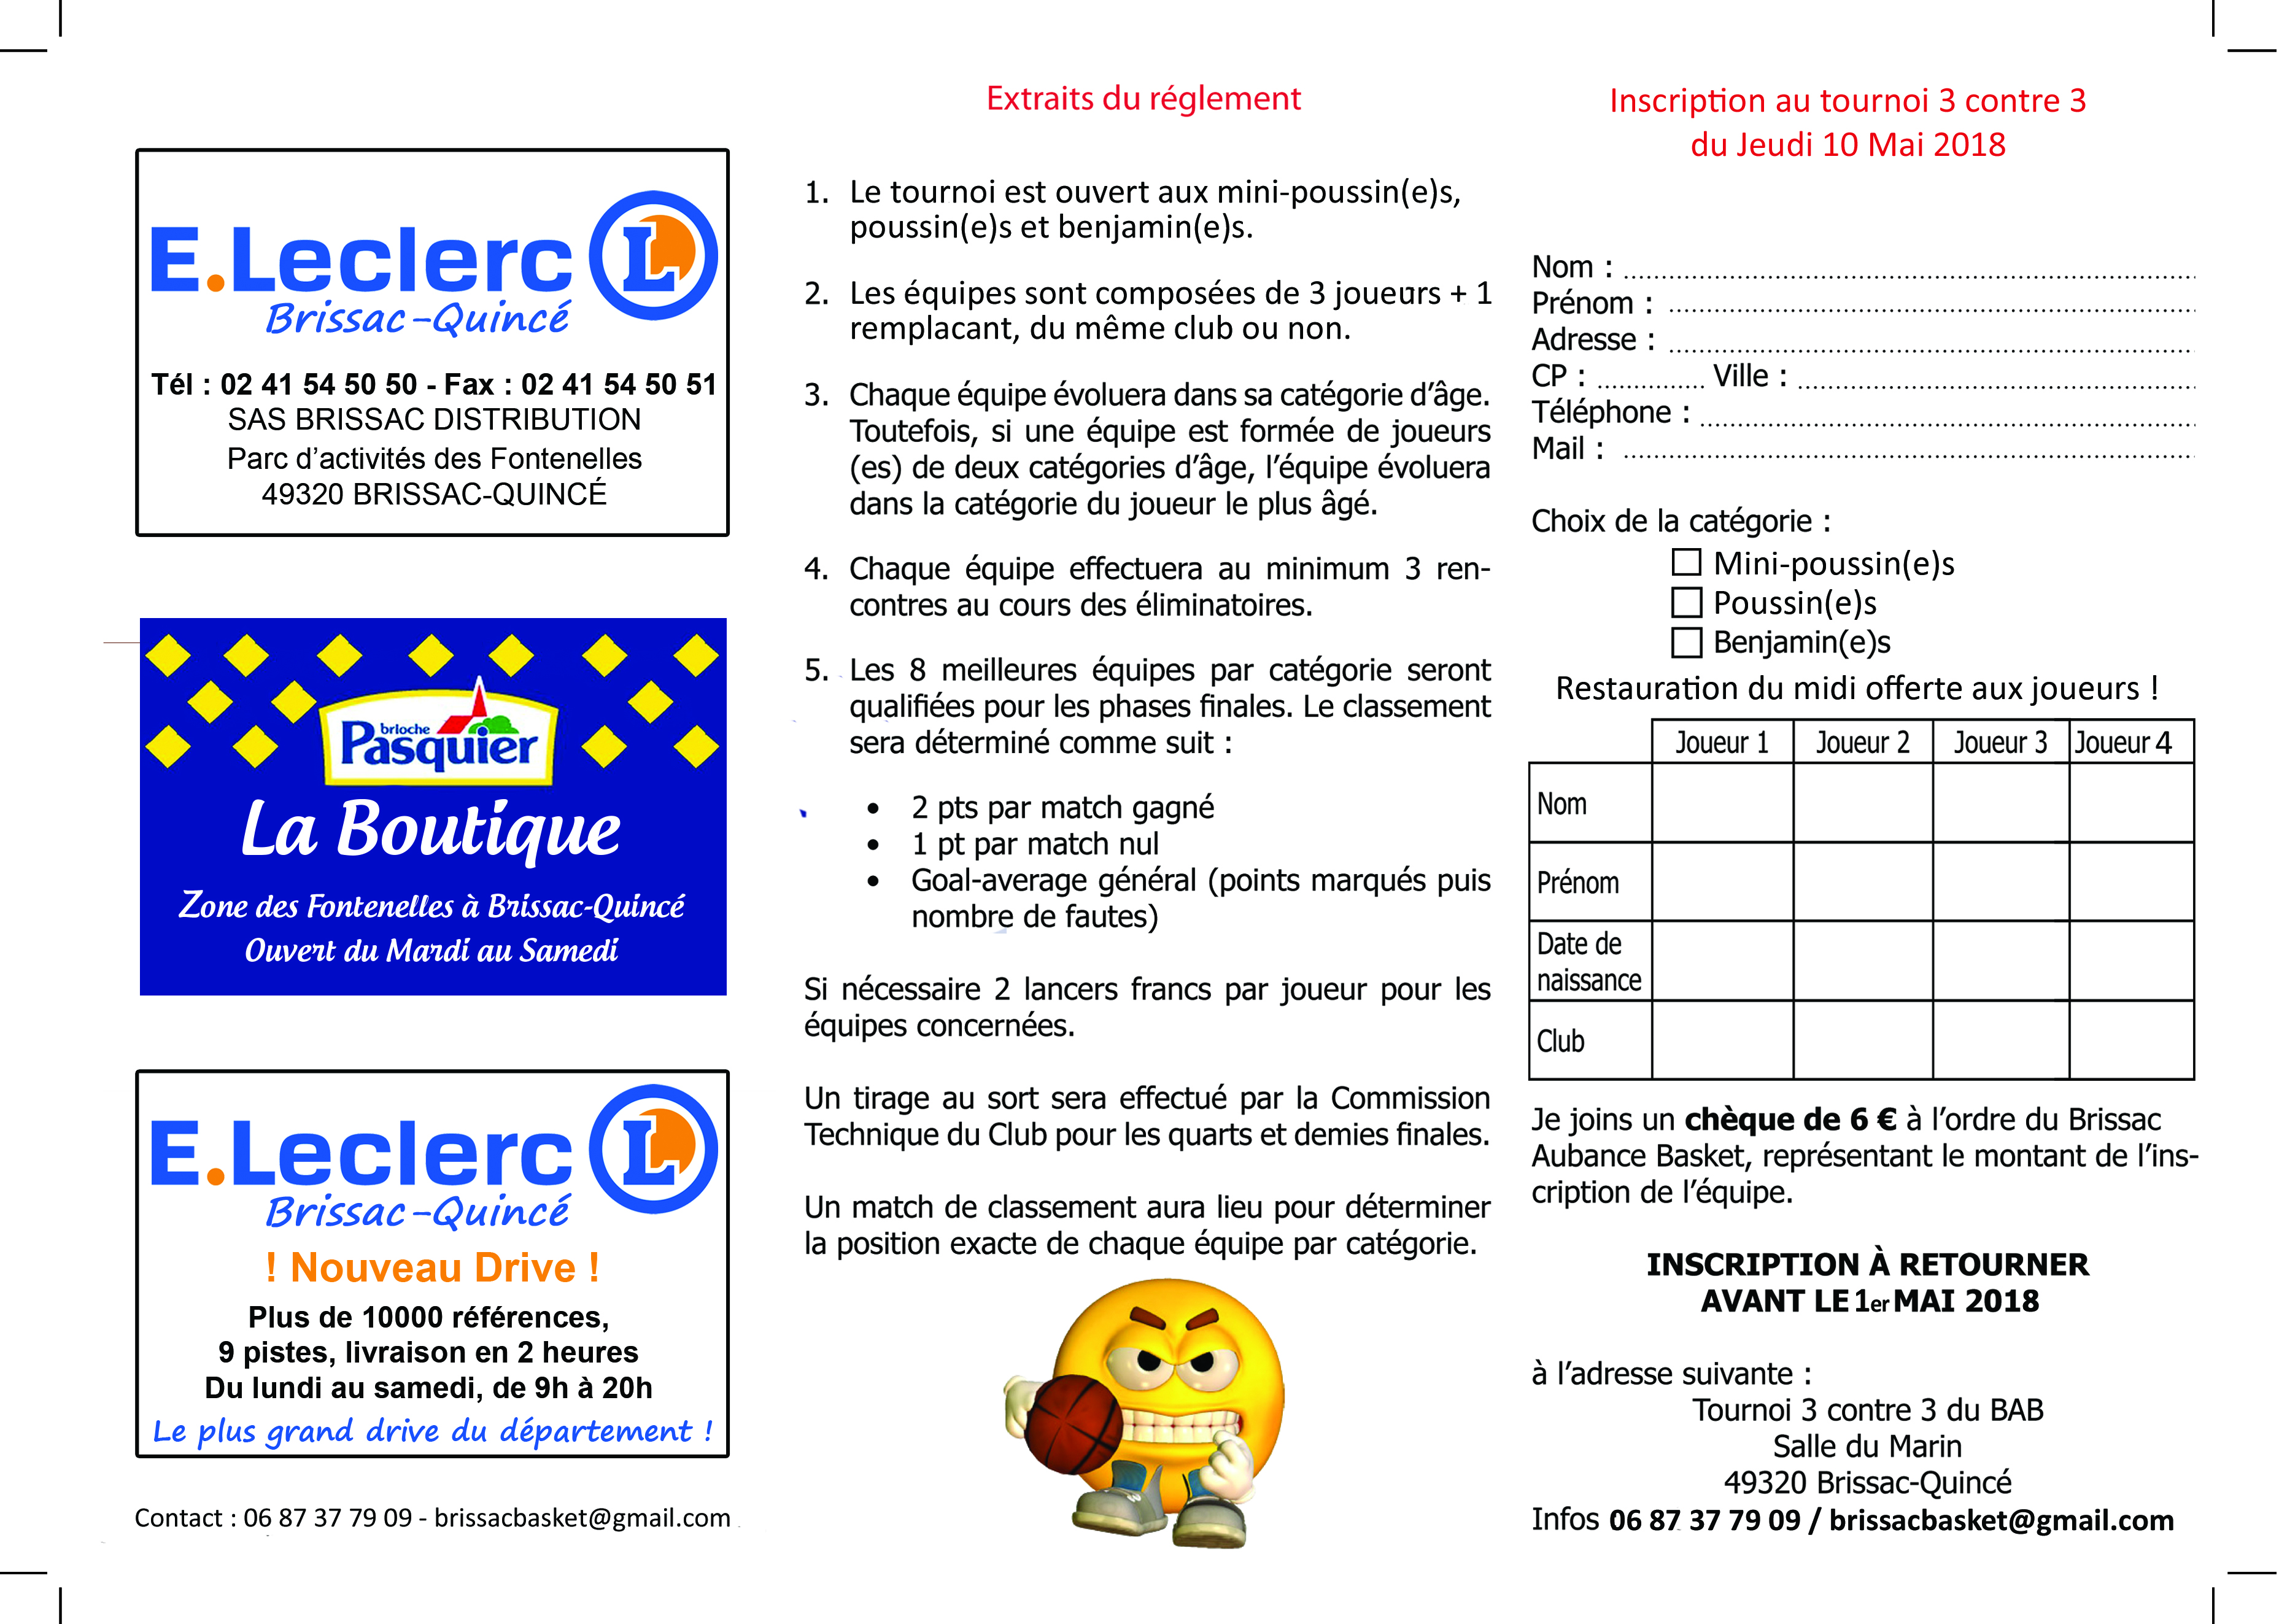 Inscription Tournoi Leclerc 2018_verso_avec_bord_de_coupe.jpg